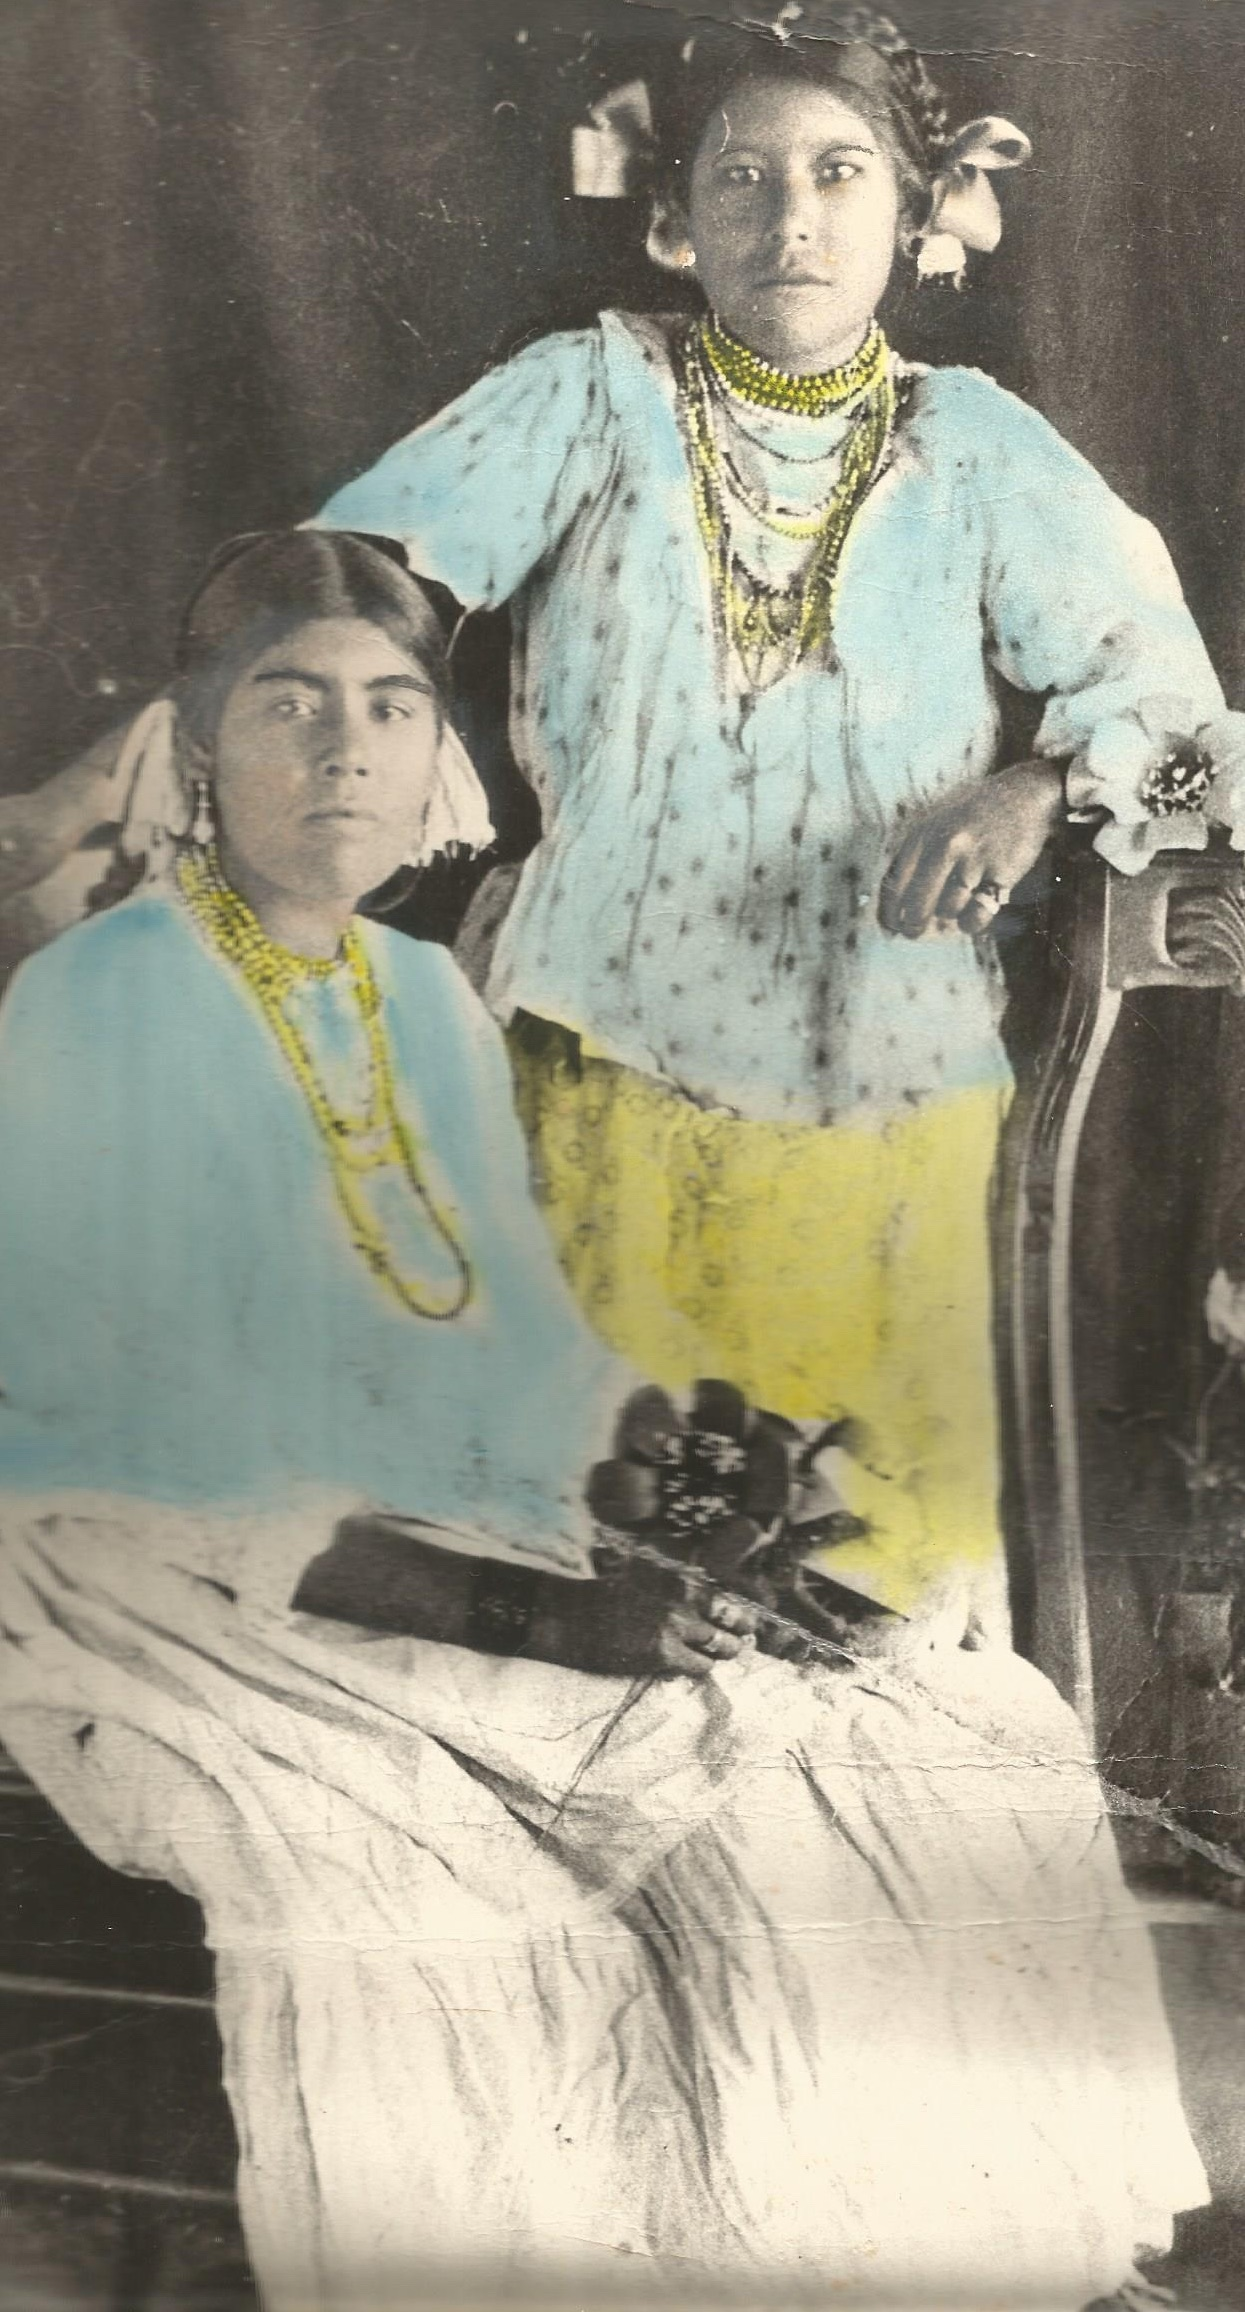 Ricarda León Flores (seated) with her first cousin Manuela, ca. 1925. Illustration in Juan Silverio Jaime León,  Testimonios de Una Mujer Yaqui  (n.p., 1998), 77.